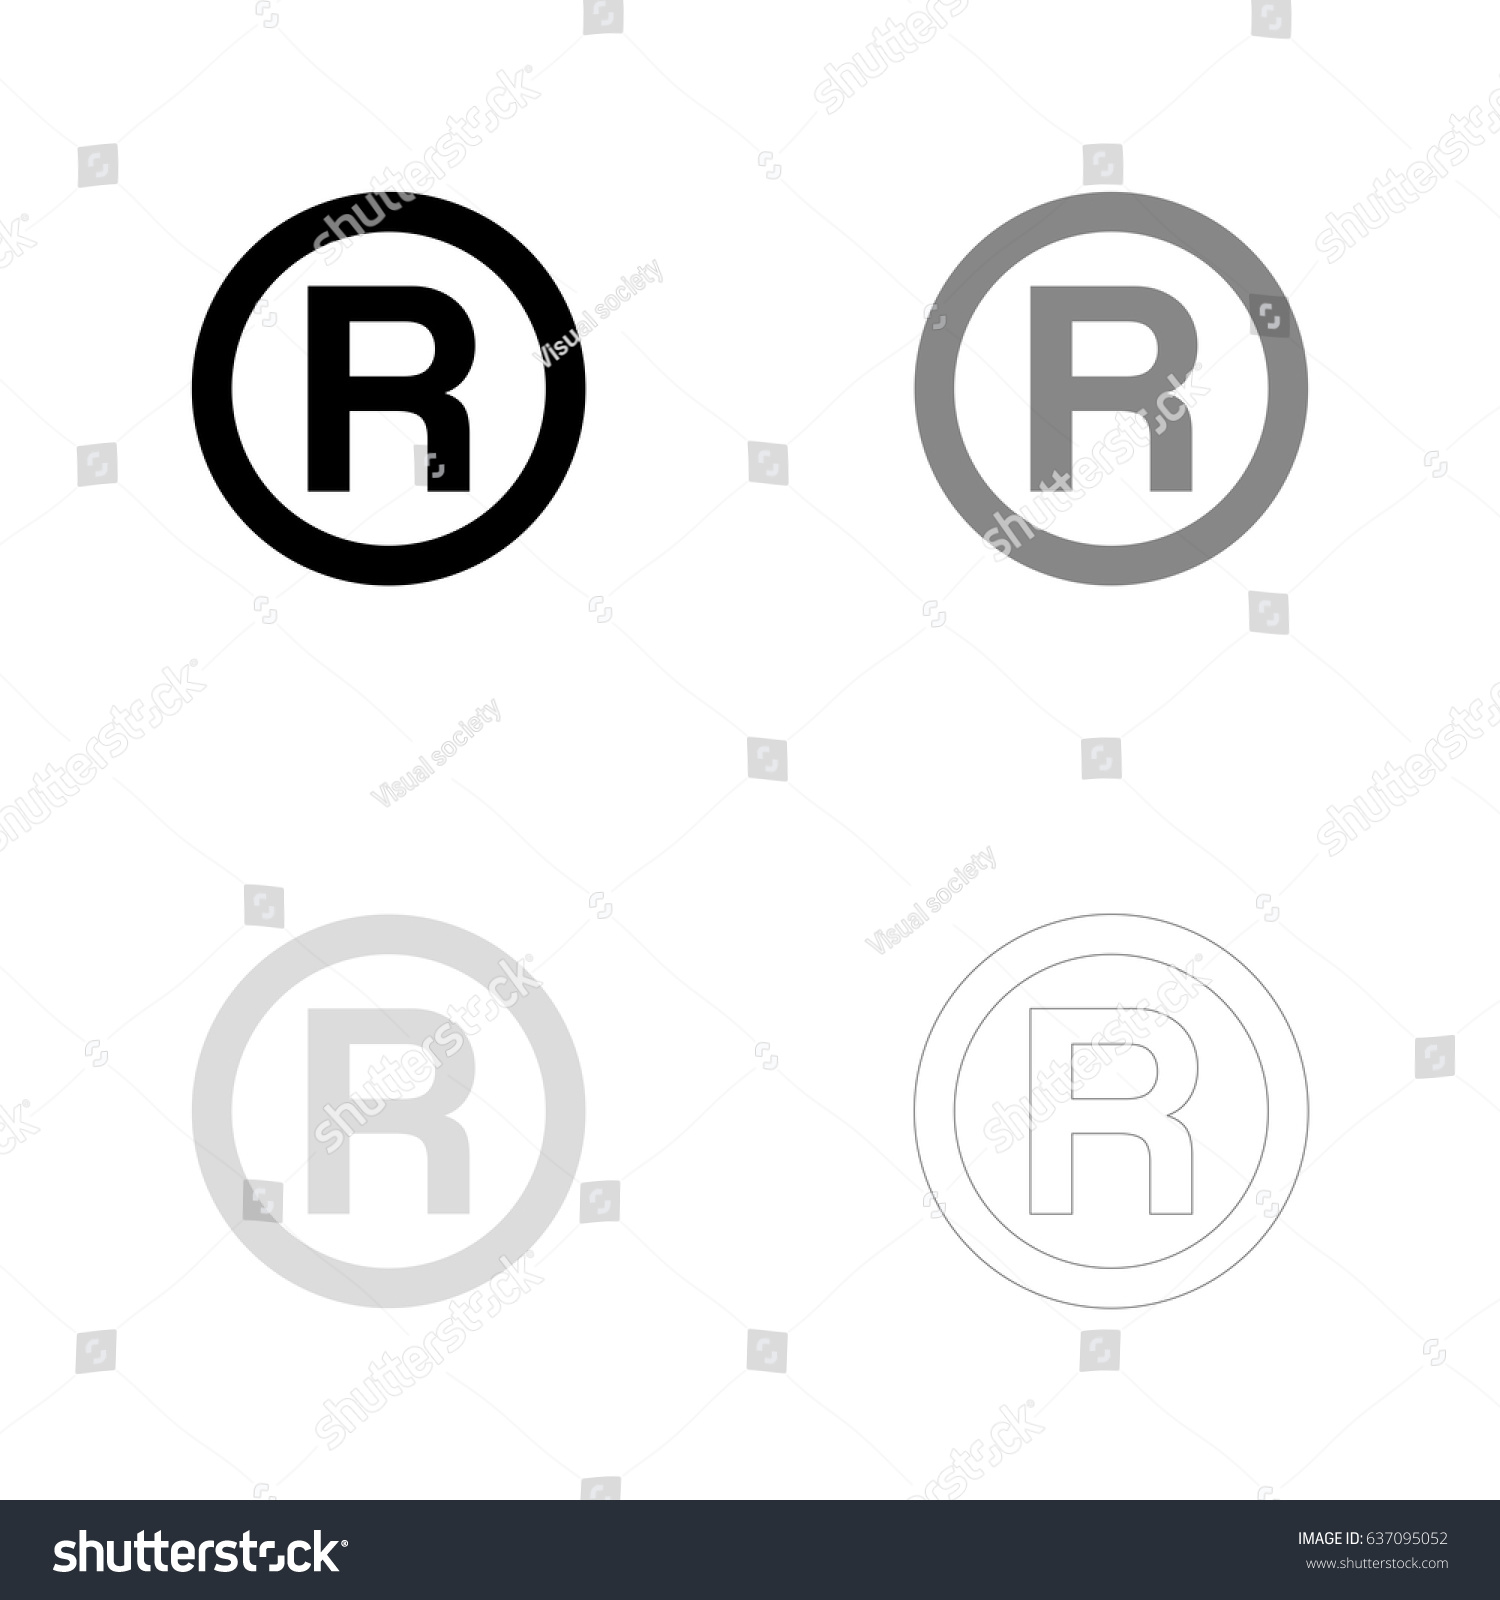 R Registered Trademark Symbol Black Gray Stock Vector Royalty Free